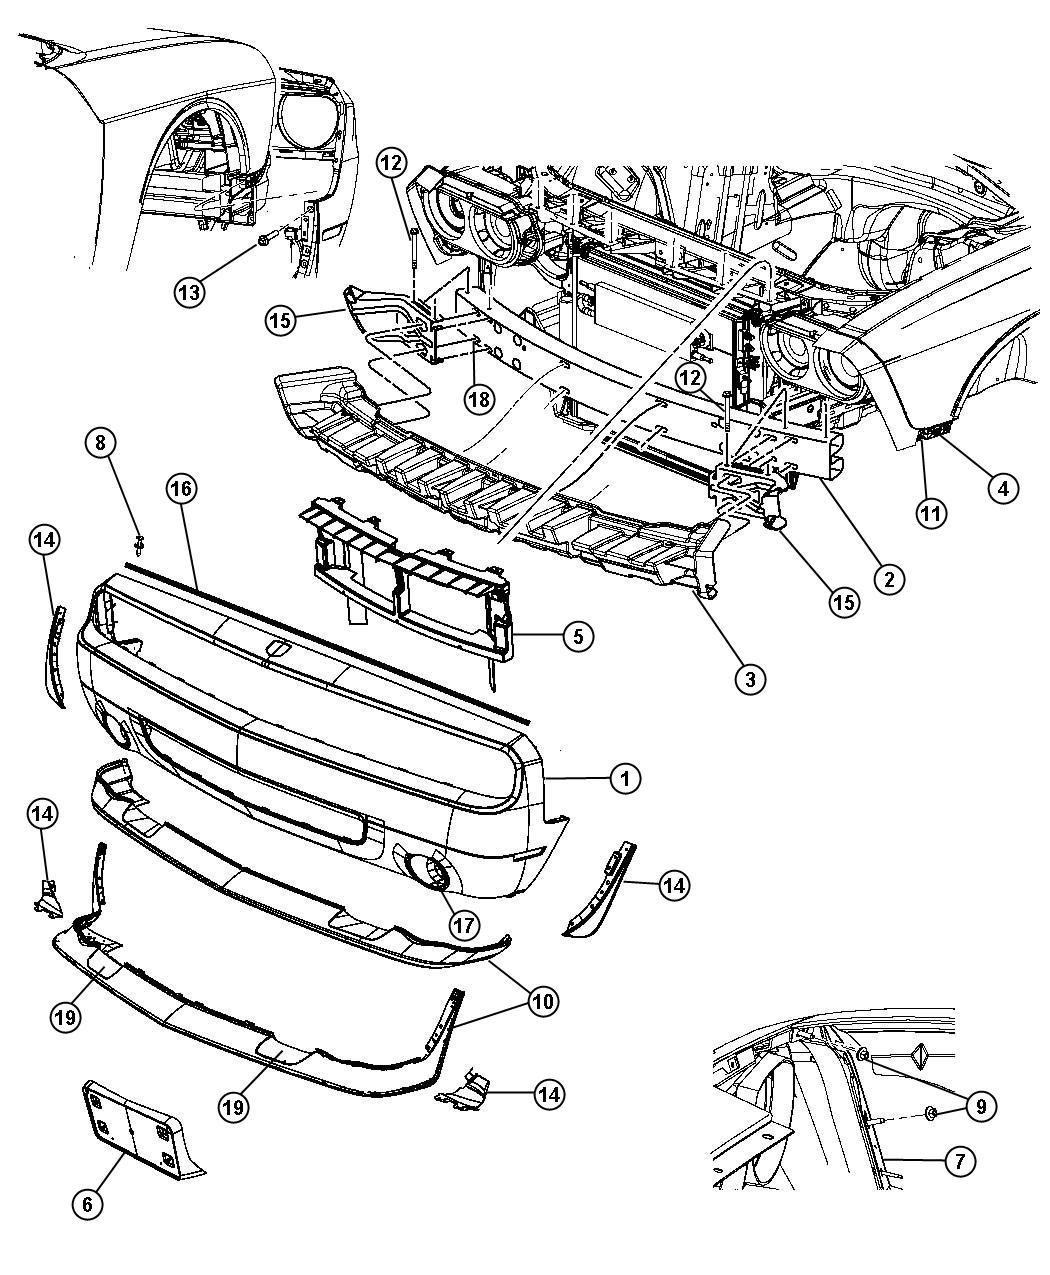 2011 Dodge Challenger Fascia. Front. Primed. [mf4], [lnj